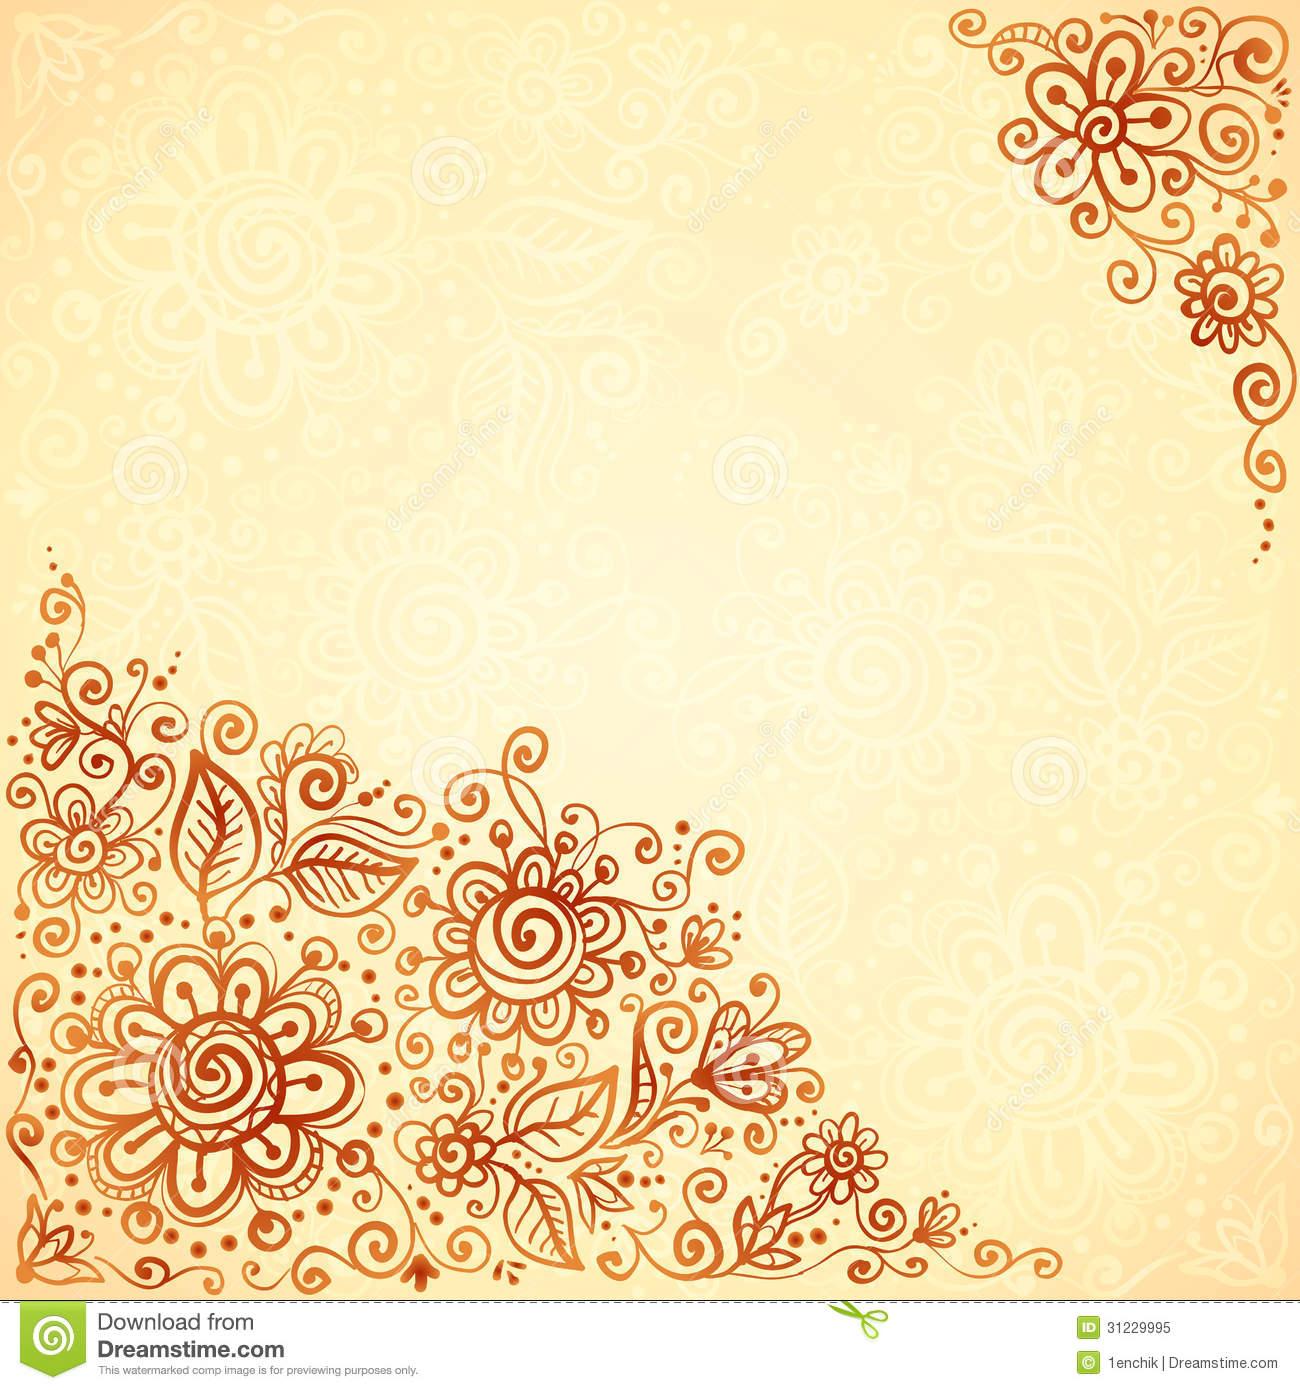 Mehndi Ceremony Background Wallpapers : Indian inspired wallpaper wallpapersafari